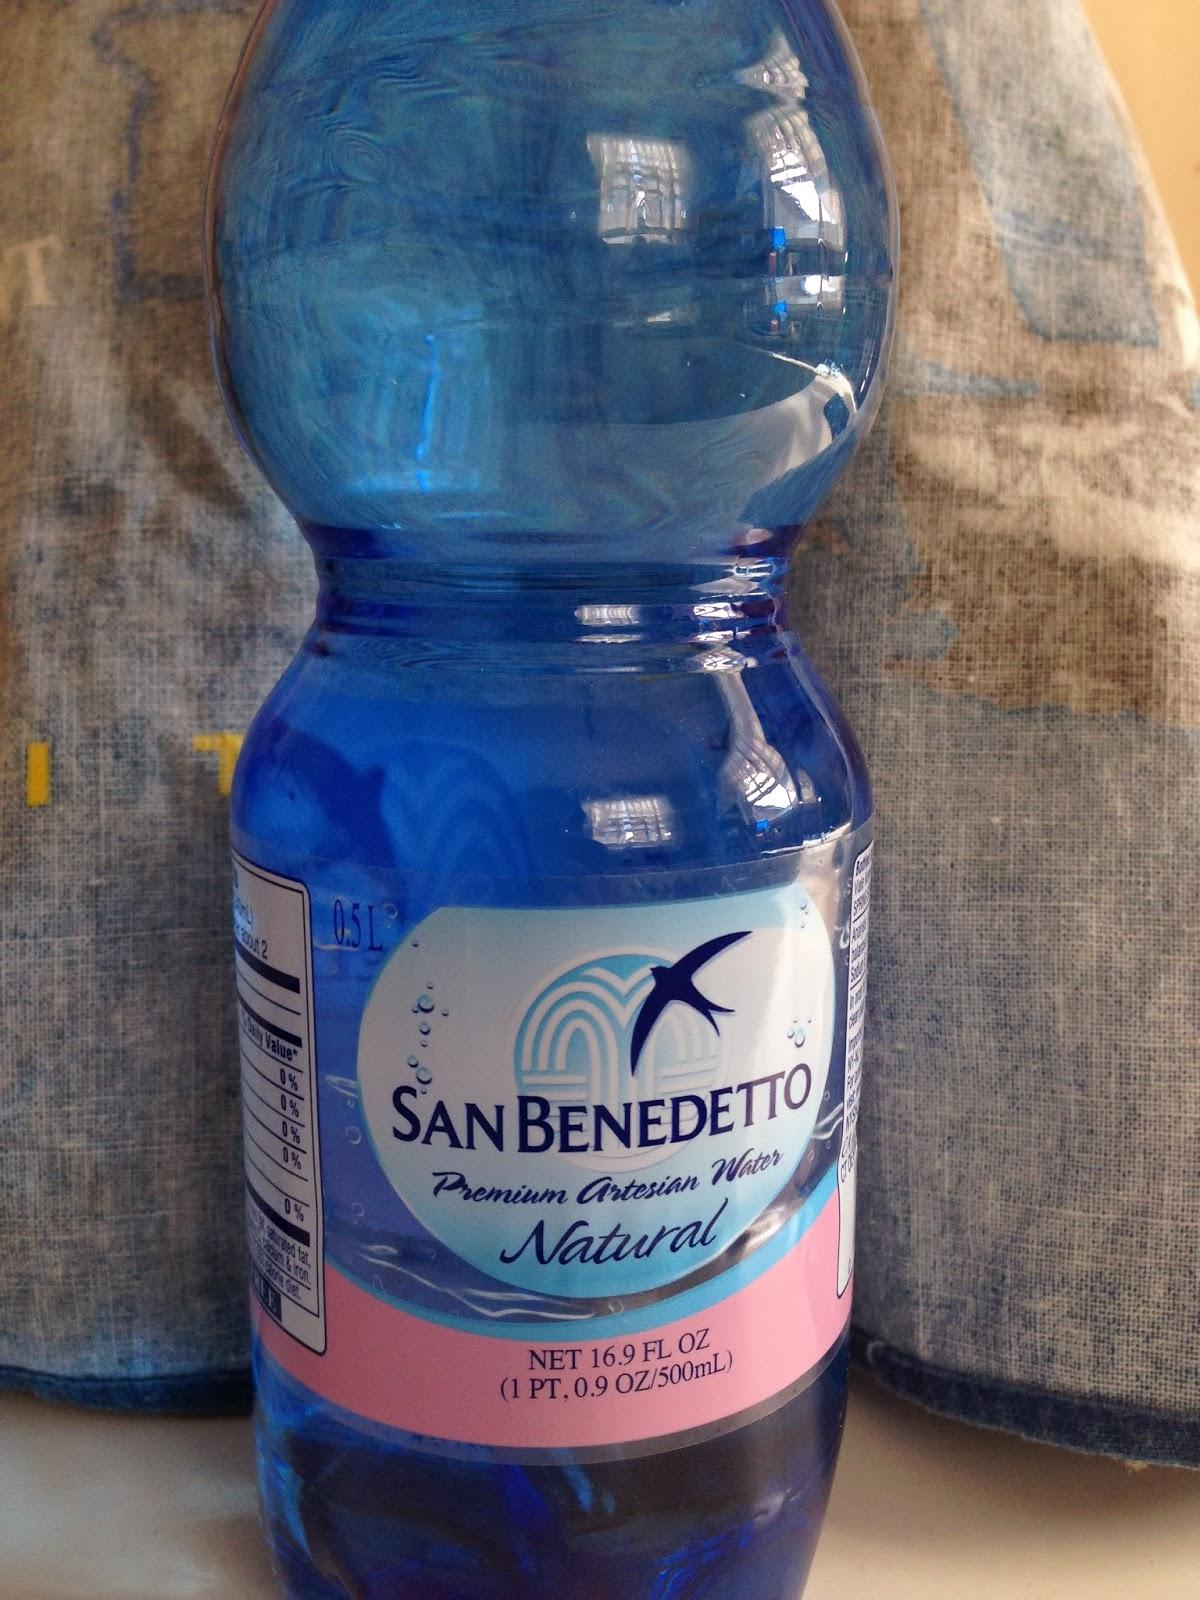 San Benedetto Premium Artesian Water - www.modenmakeup.com